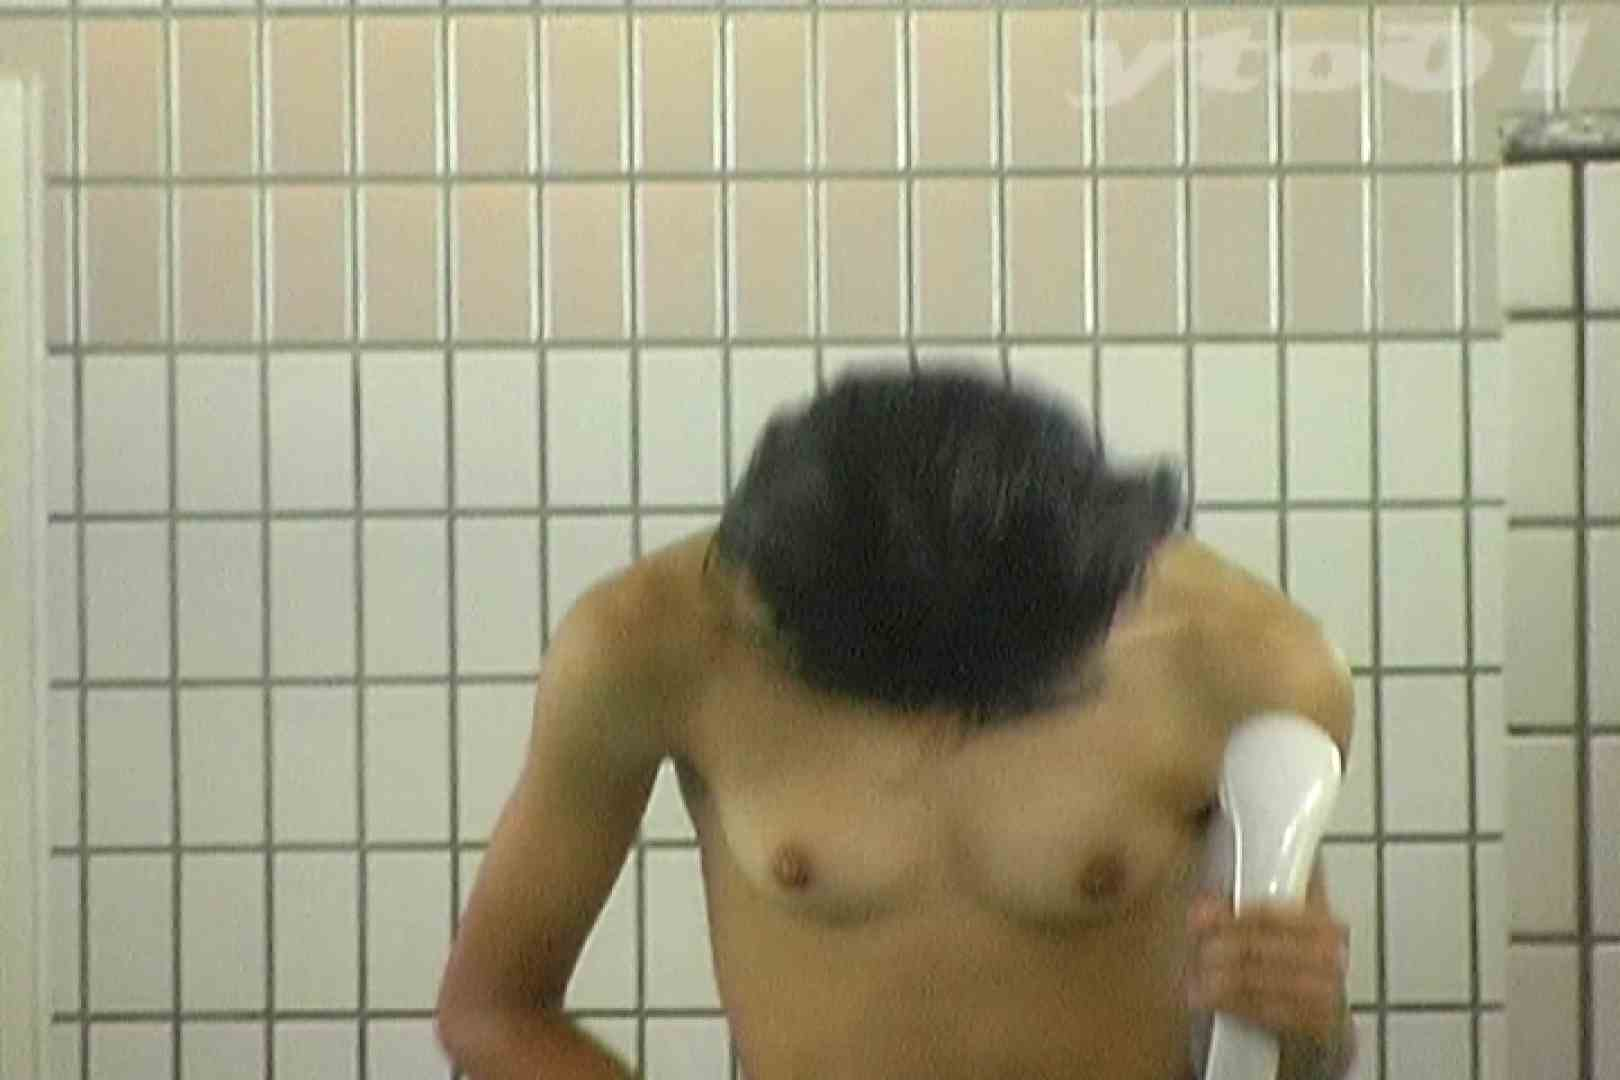 ▲復活限定▲合宿ホテル女風呂盗撮 Vol.08 女湯 オメコ無修正動画無料 83画像 76